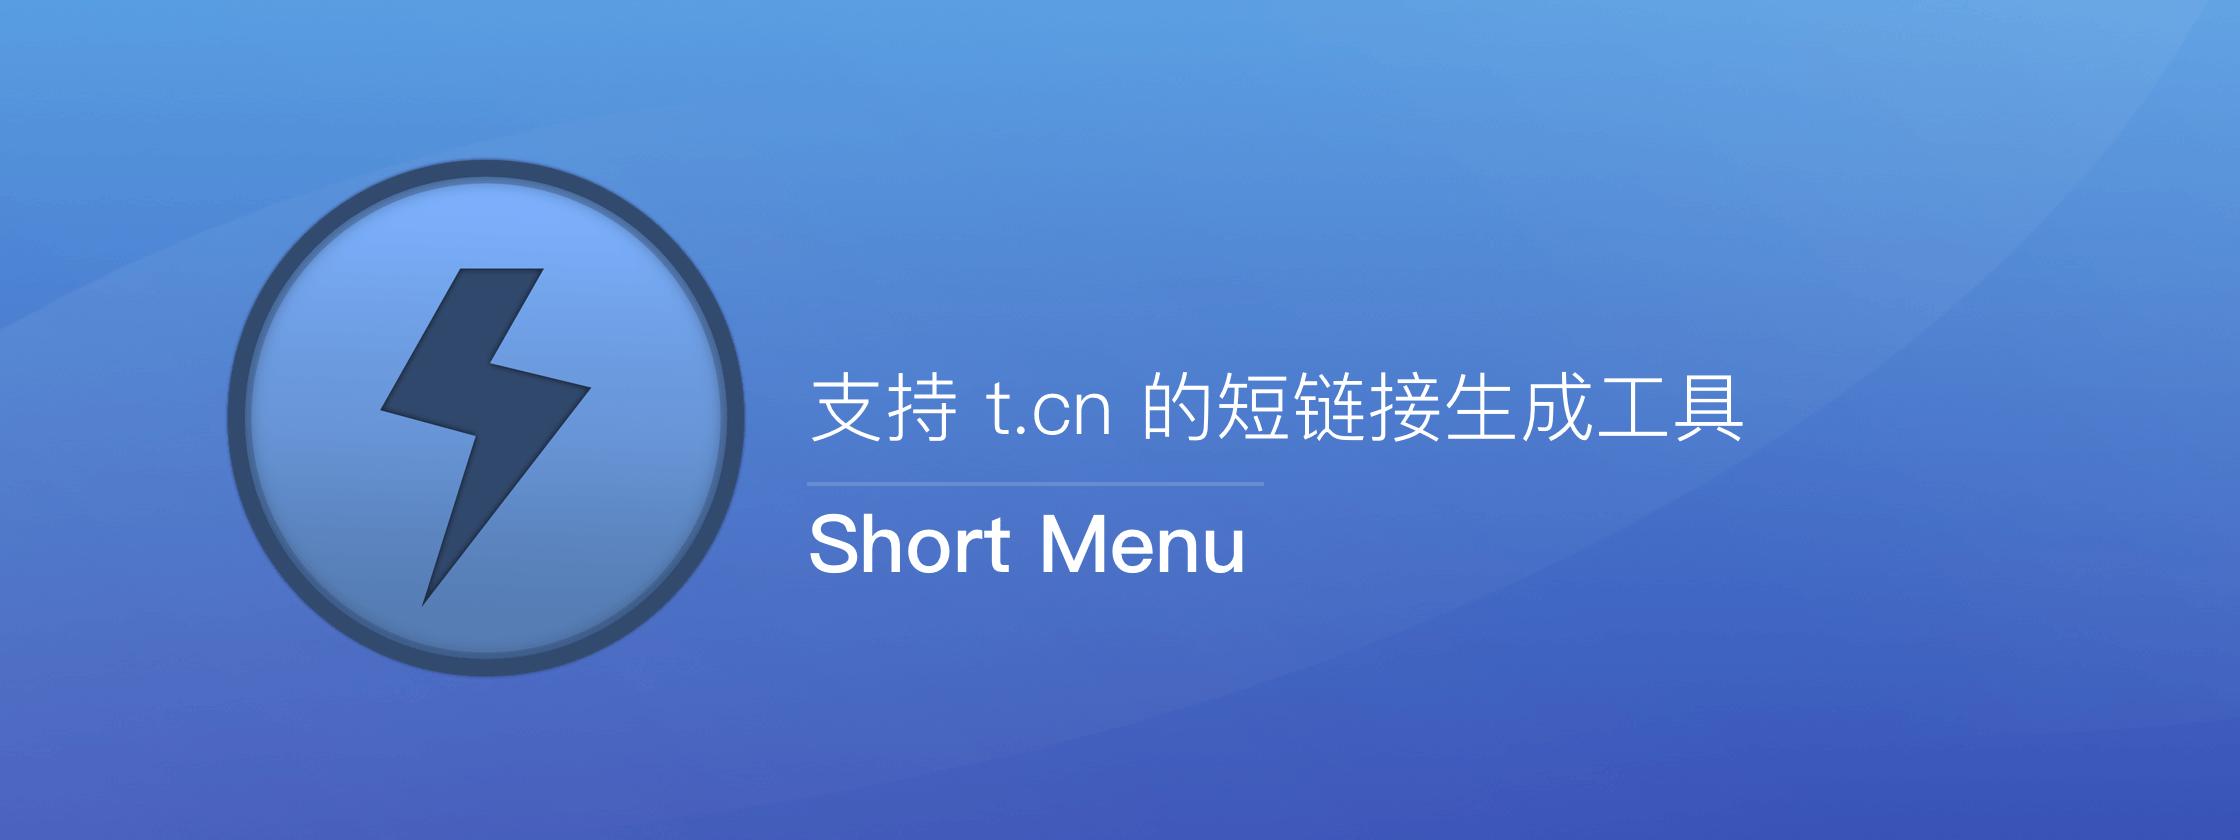 Short Menu – 支持 t.cn 的短链接生成工具